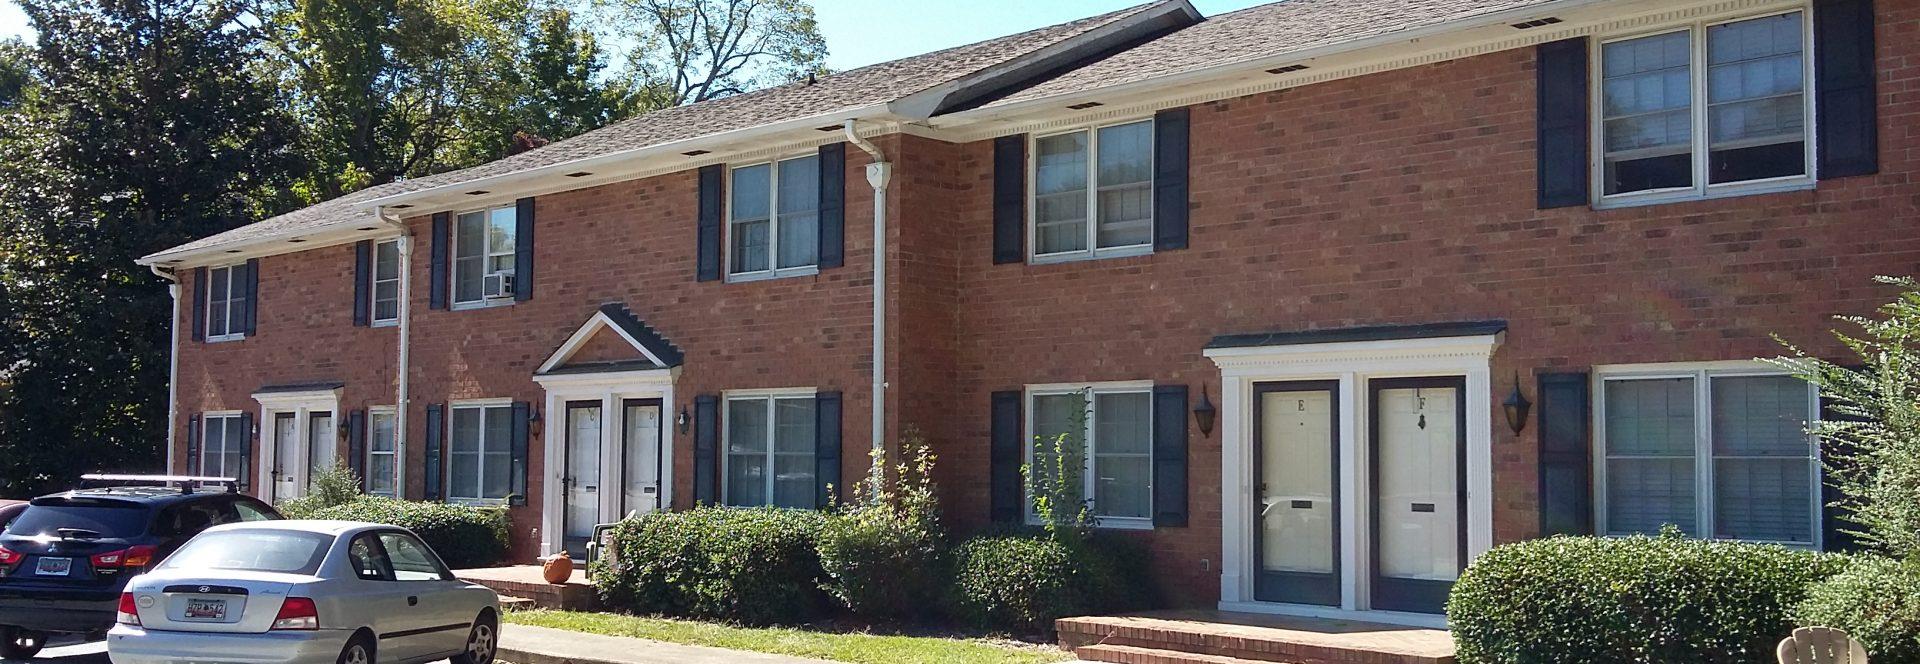 Azalea Realty   Managed Rental Properties in Anderson SC